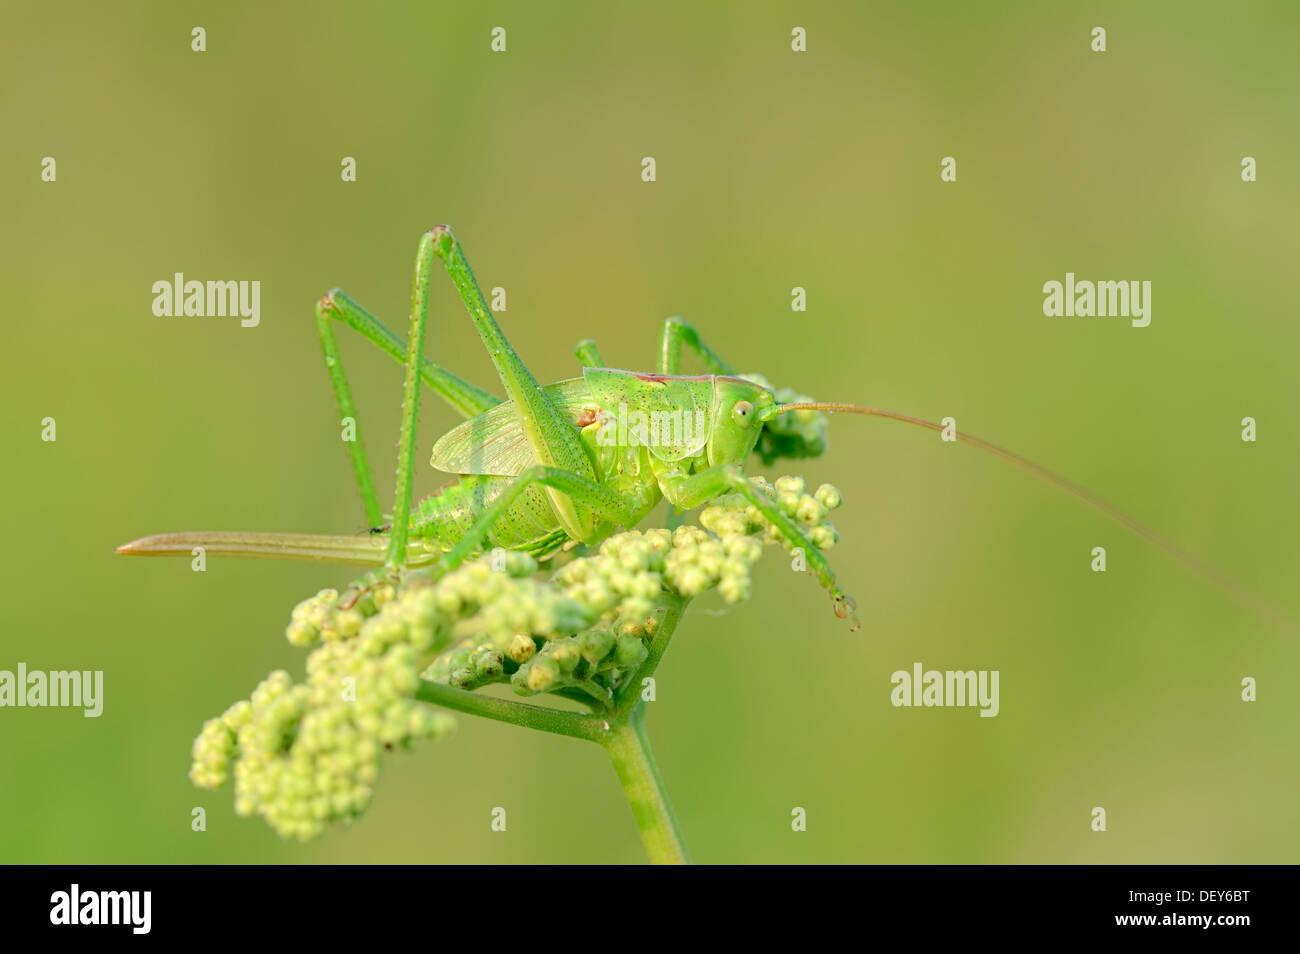 Große grüne Bush Cricket (Tettigonia Viridissima), Weiblich, larval Stadium, North Rhine-Westphalia, Germany Stockbild